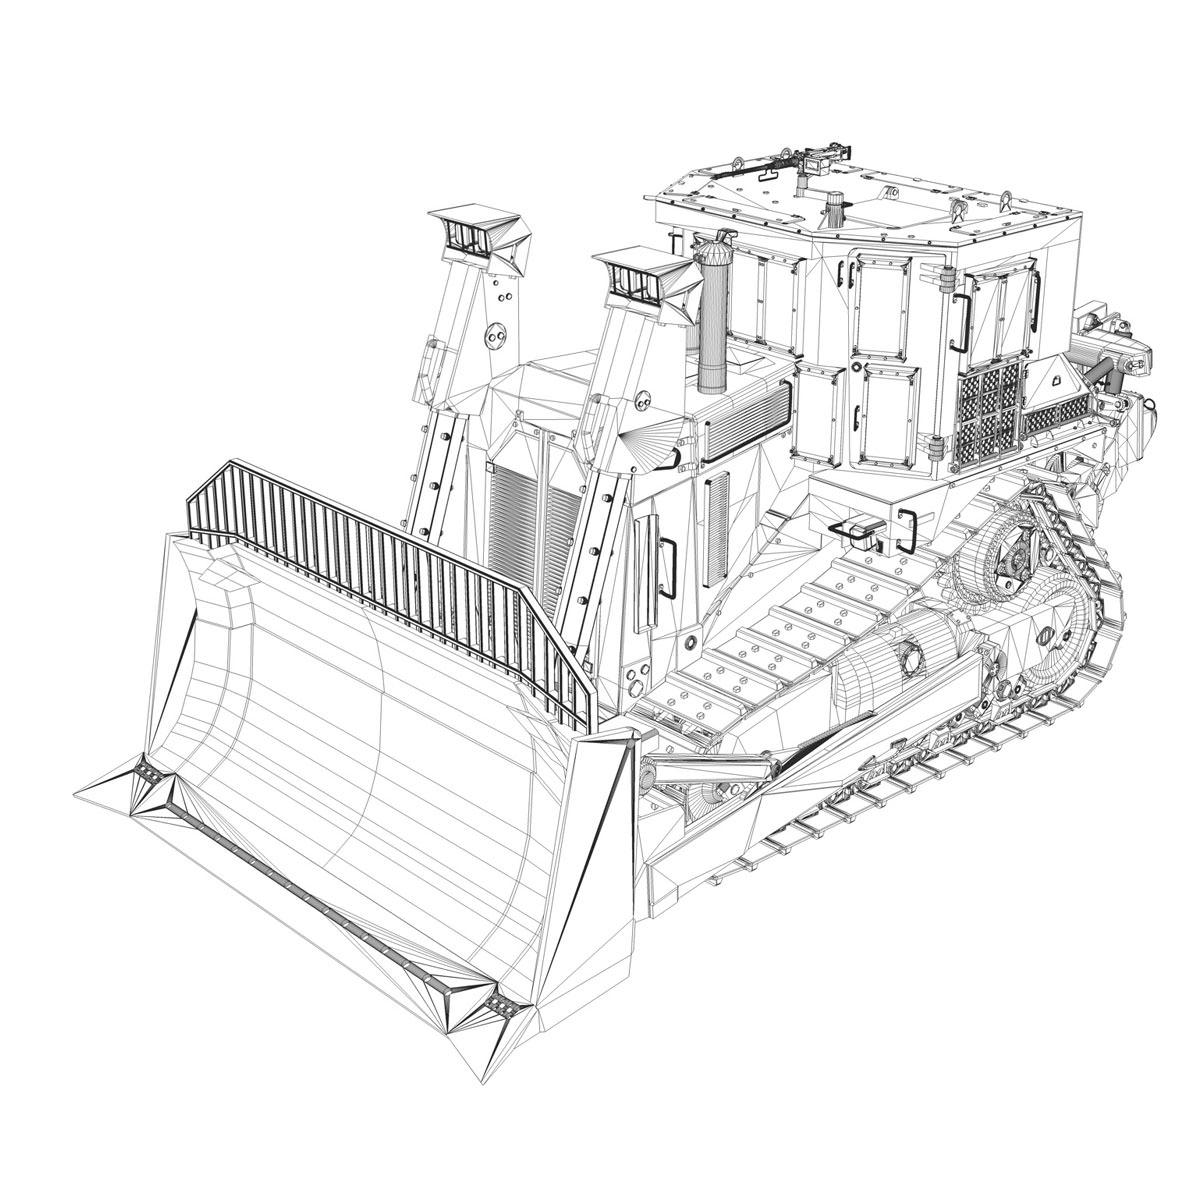 armored cat d9r bulldozer 3d model obj 3ds fbx c4d lwo lw